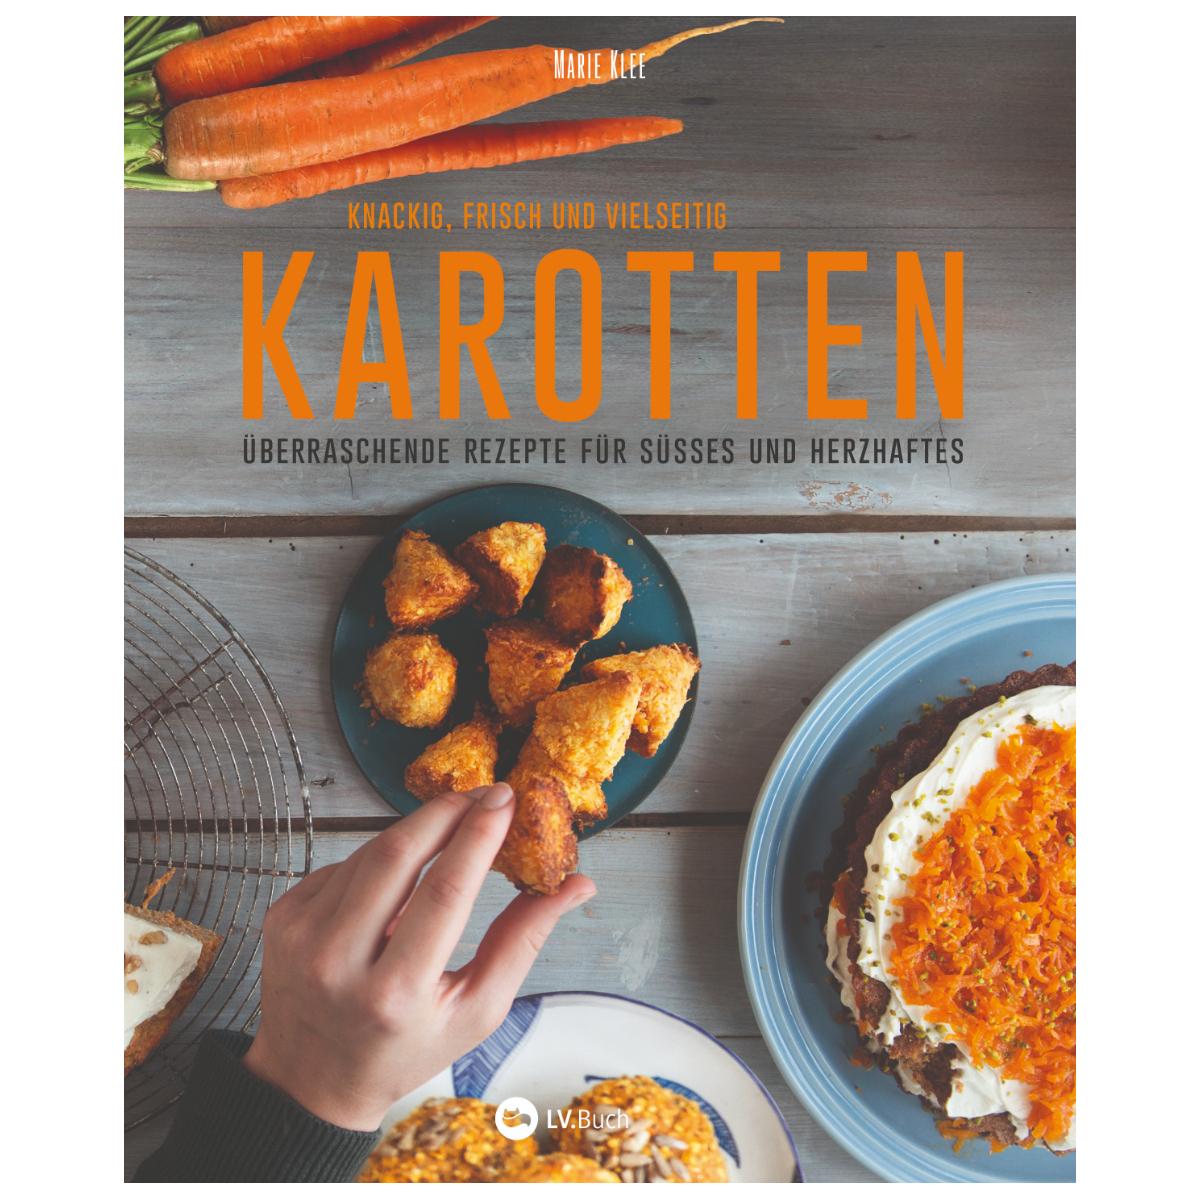 Karotten_Kochbuch